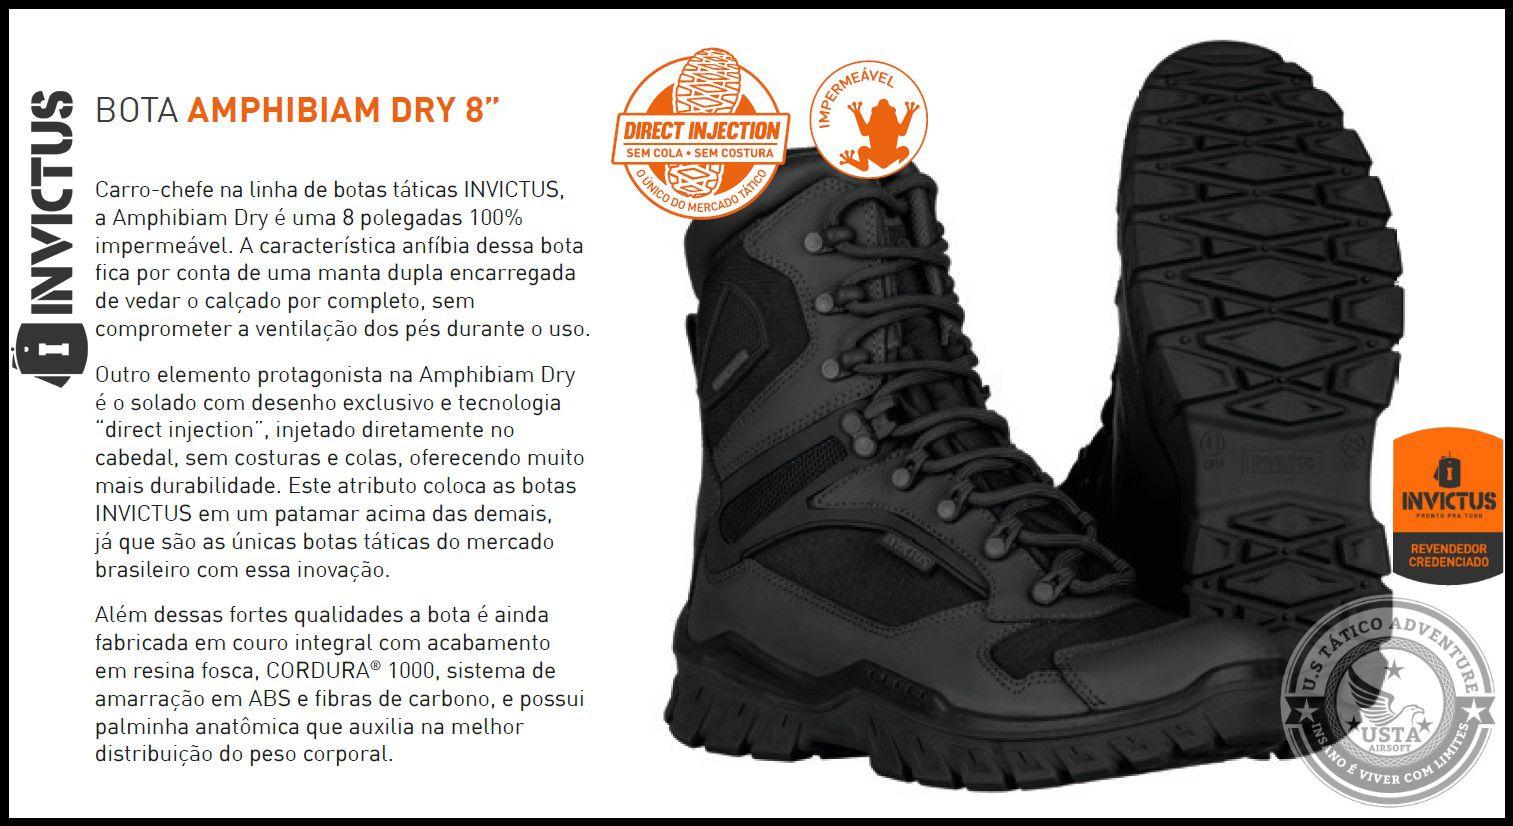 Bota AMPHIBIAM Dry Impermeável - INVICTUS PRETA